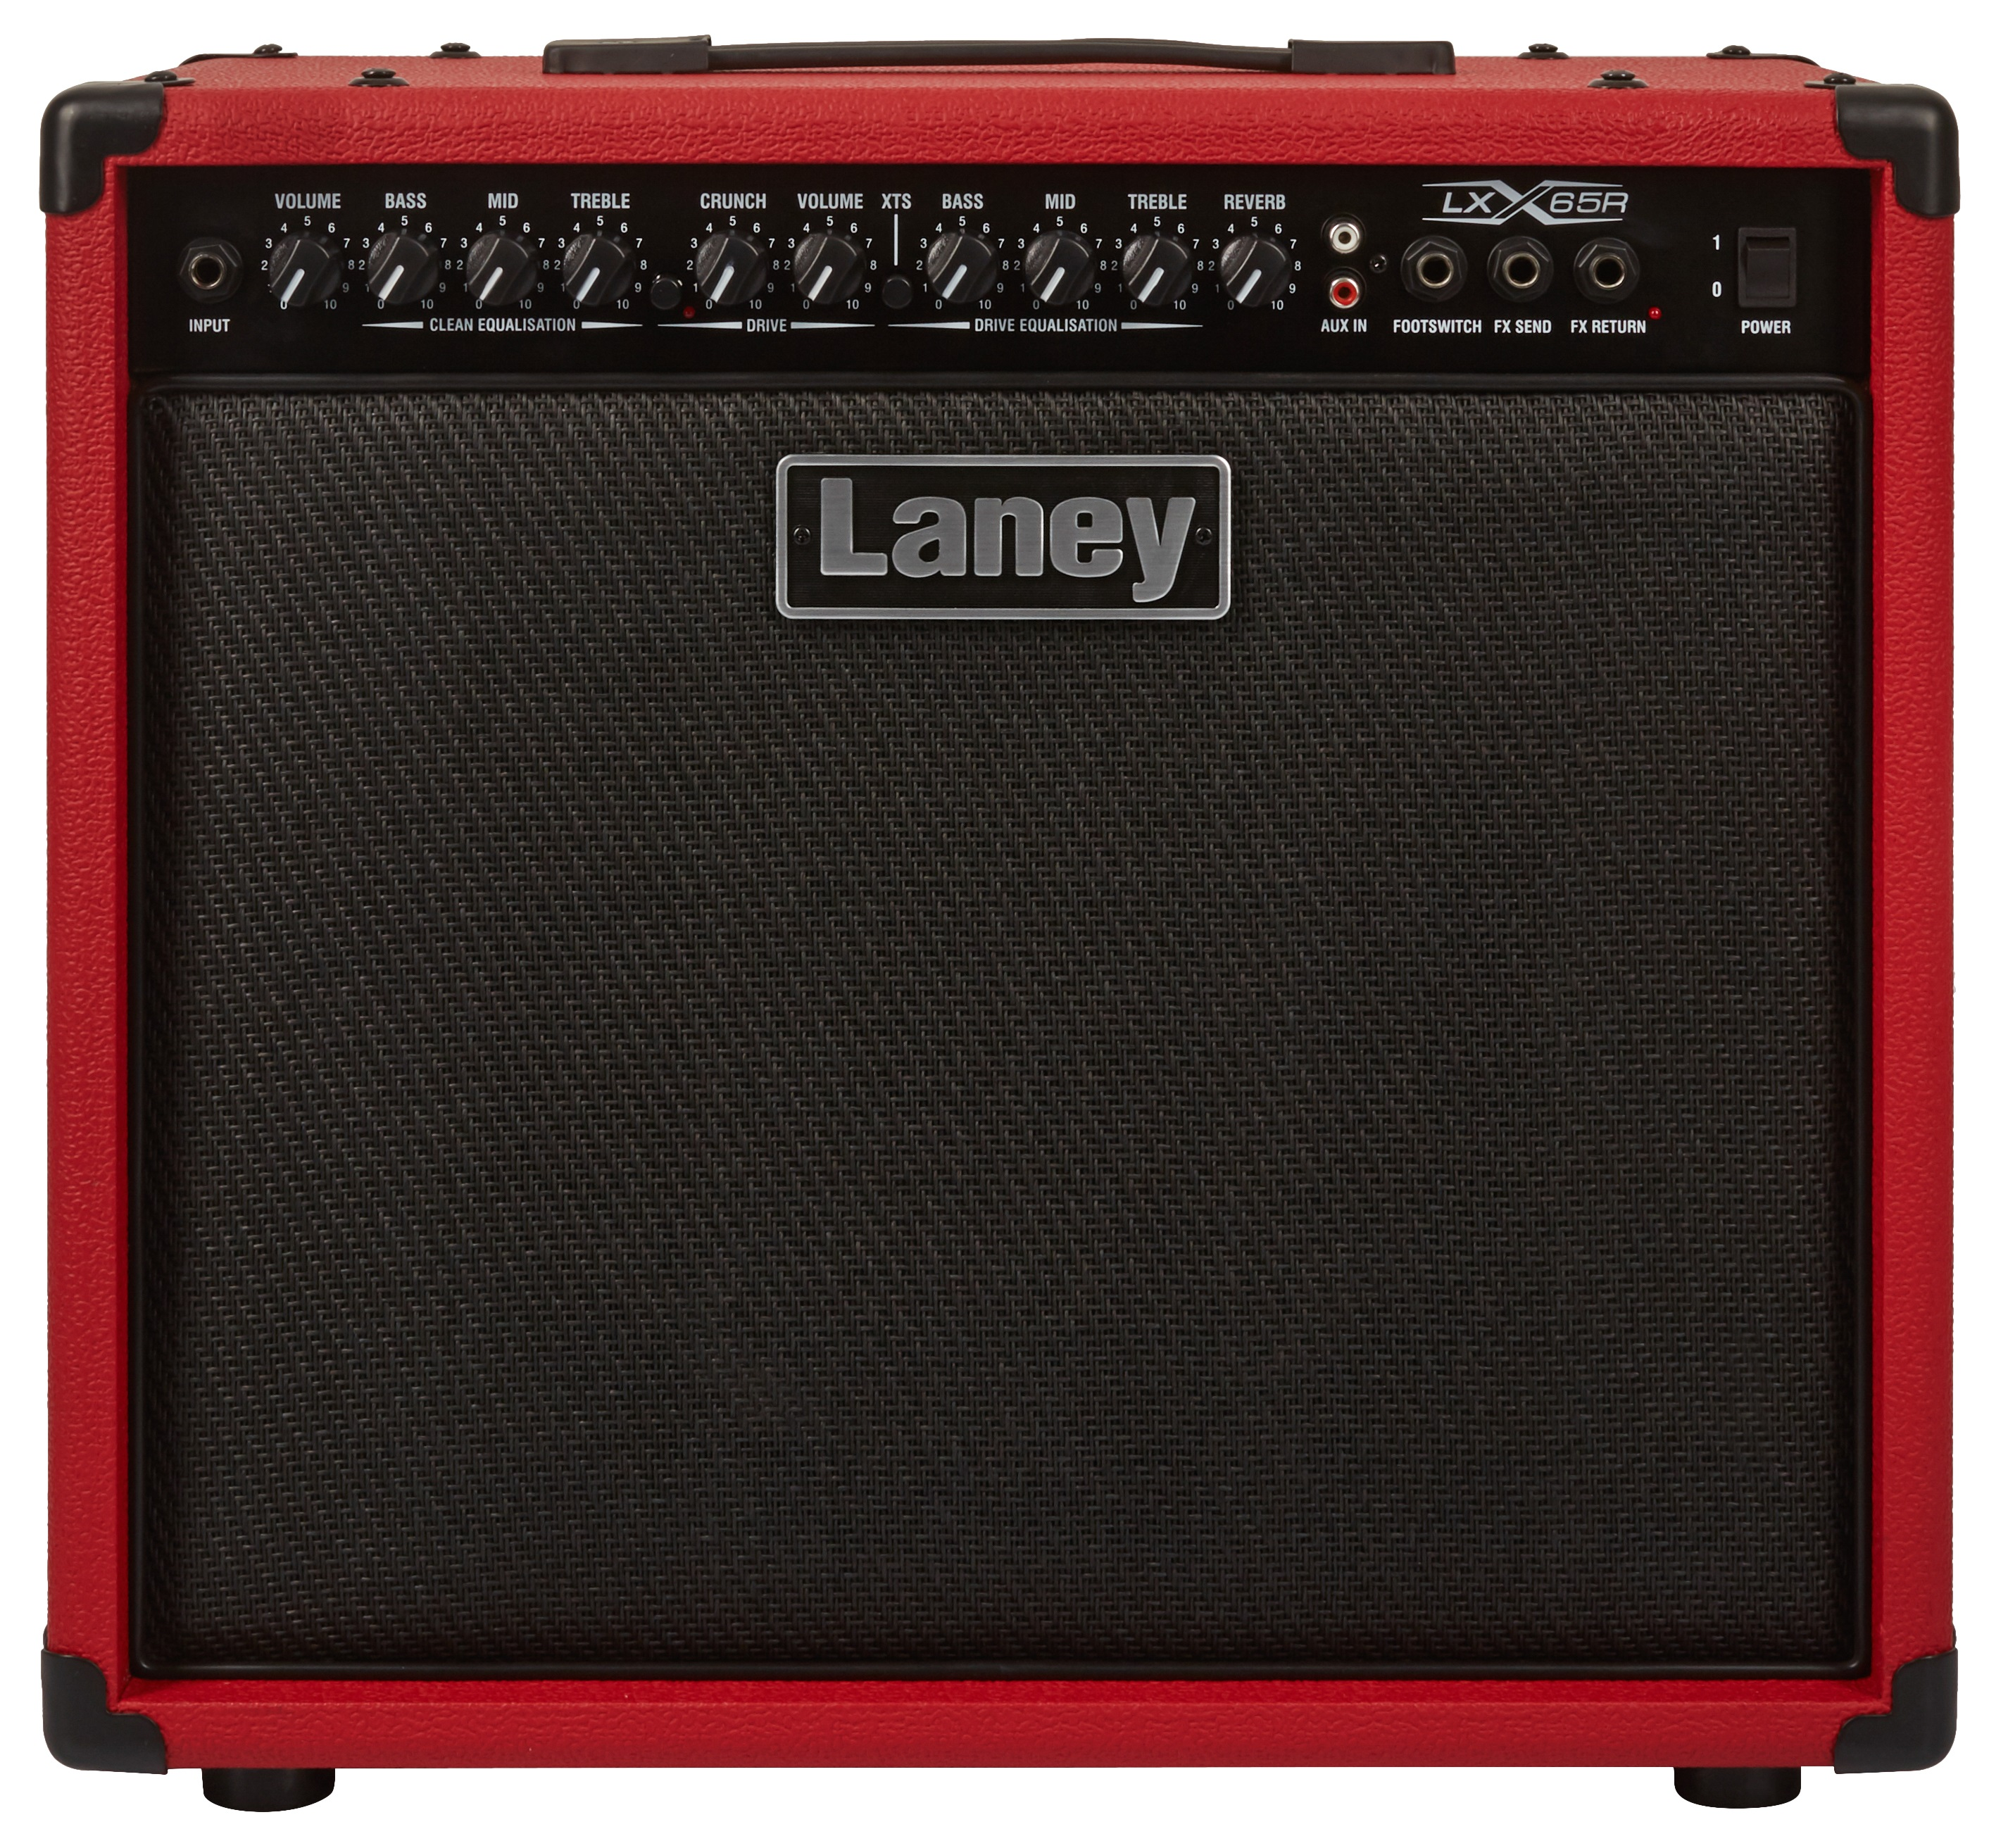 Laney LX65R RD